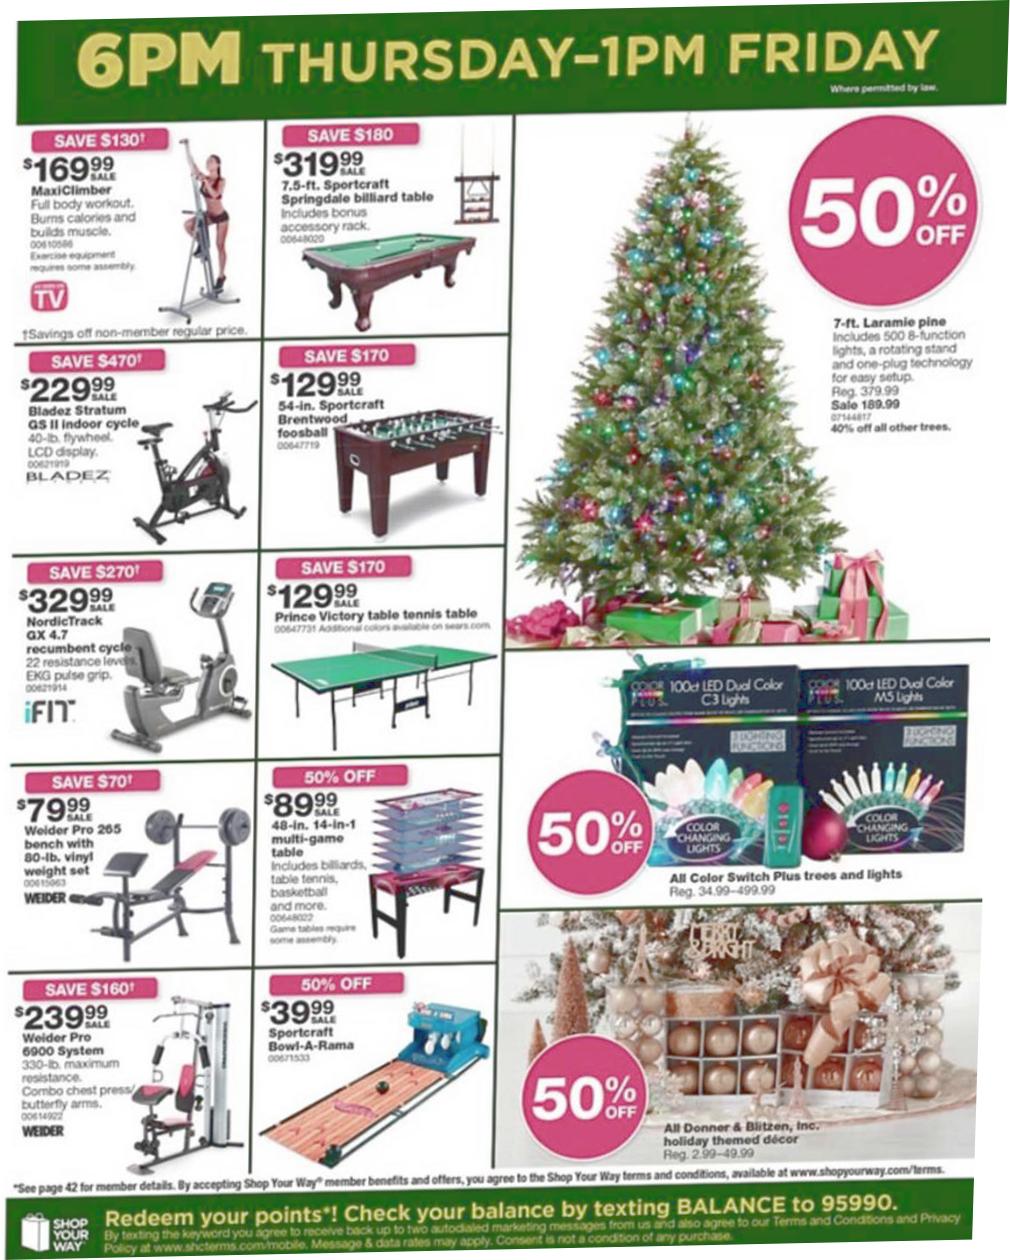 Sears Black Friday 2018 Sale & Ad Scan - Blacker Friday